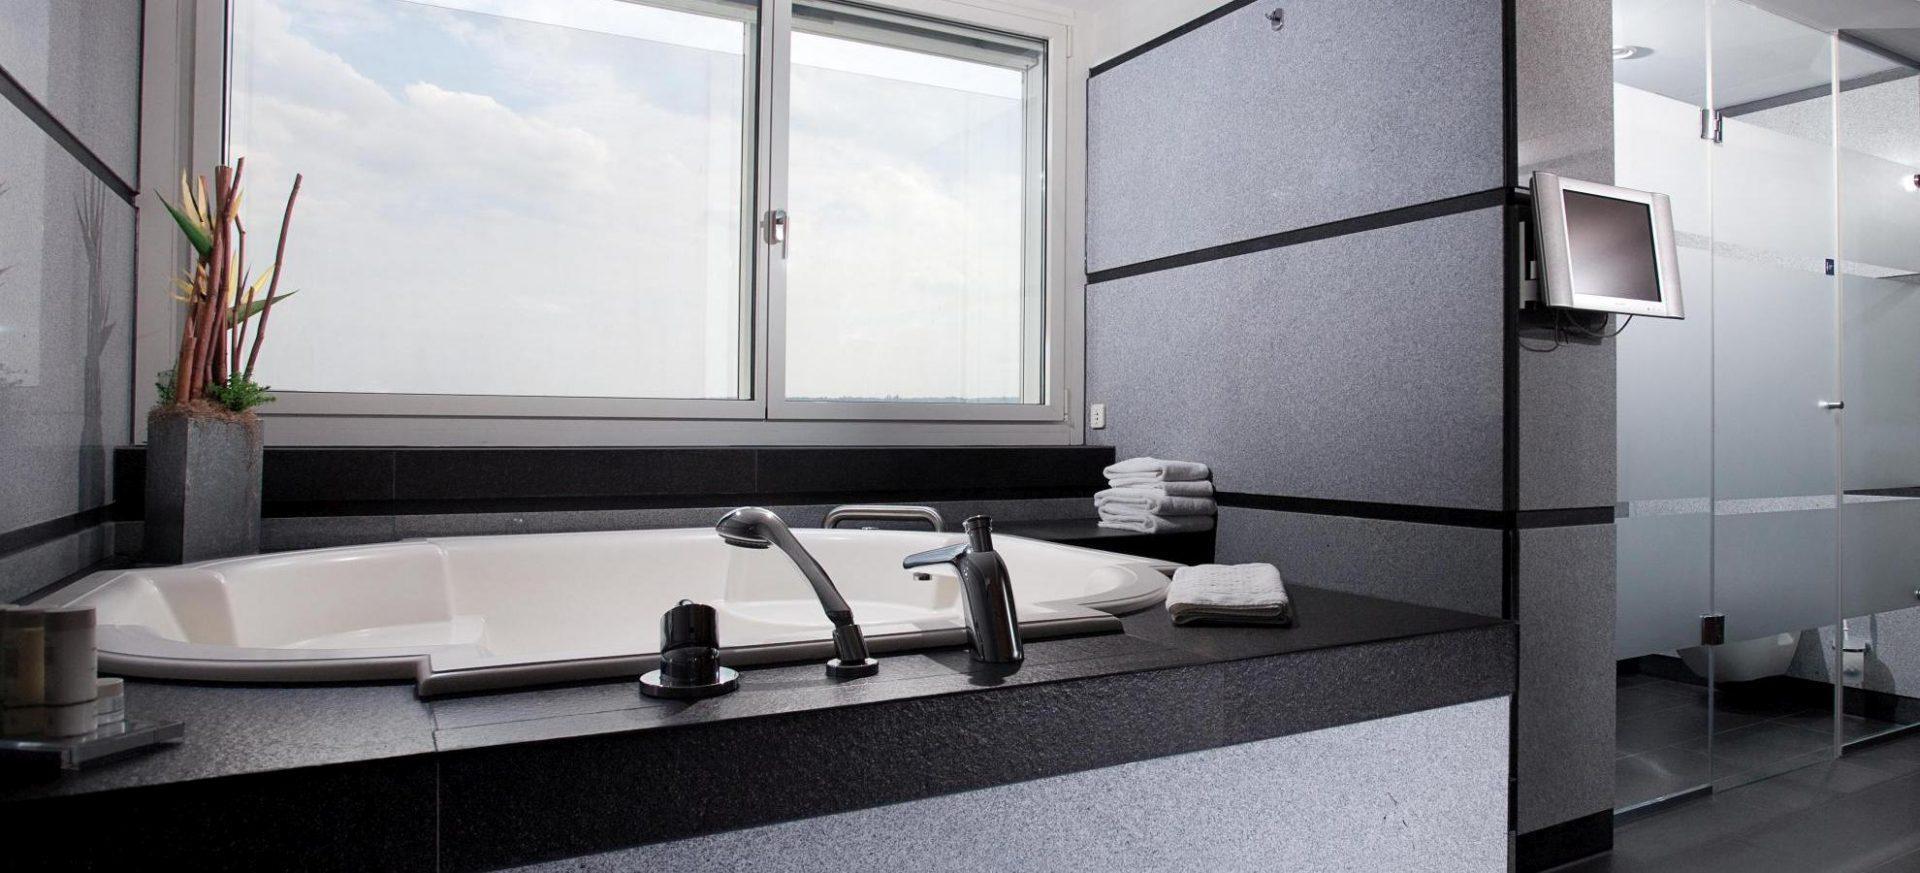 Radisson Blu Hotel Erfurt Präsidenten Suite Badezimmer / Presidential Suite bathroom